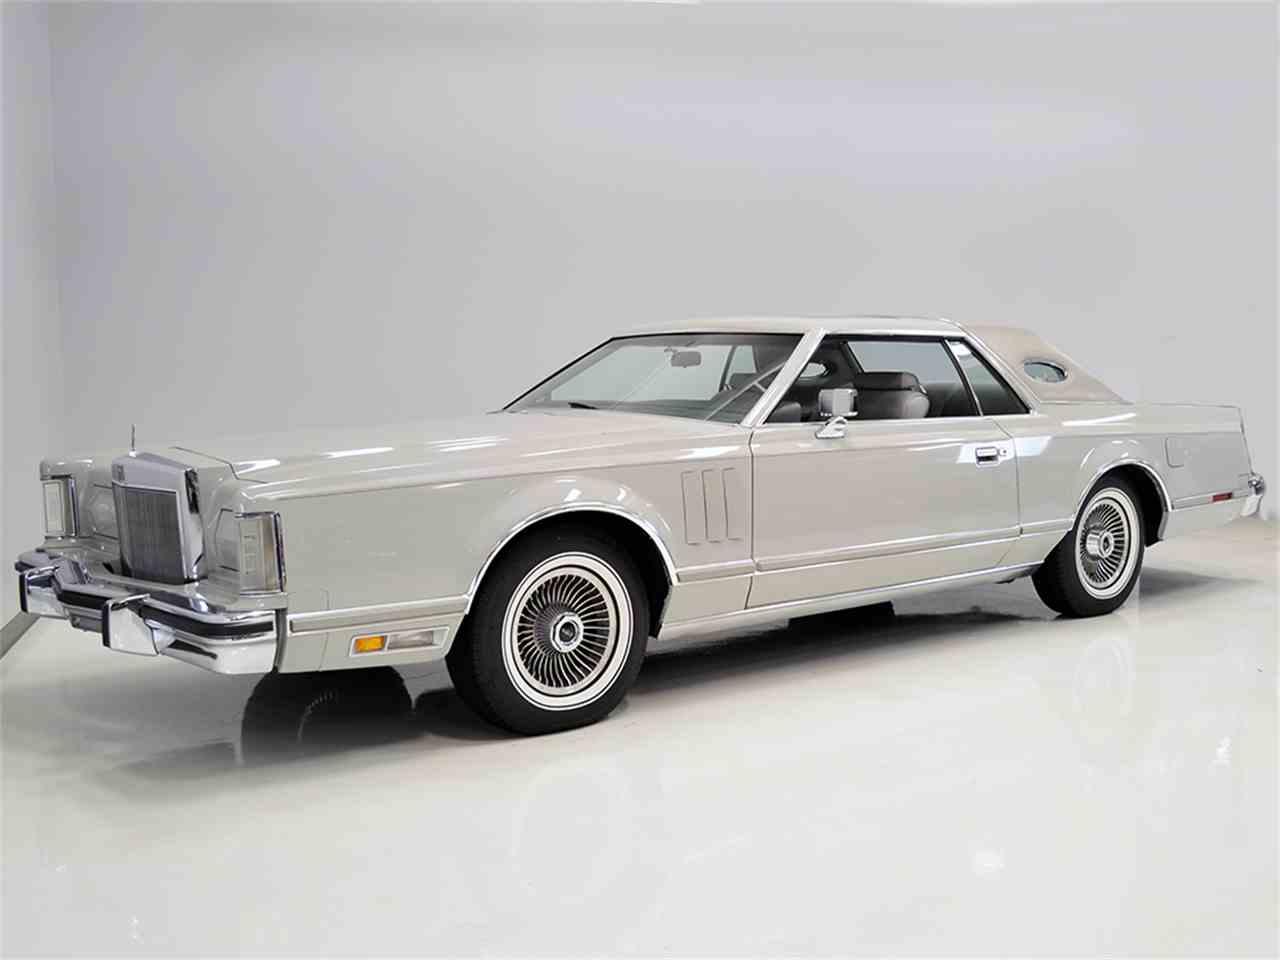 Large Picture of 1977 Lincoln Continental Mark V - $13,900.00 Offered by Harwood Motors, LTD. - JOGC